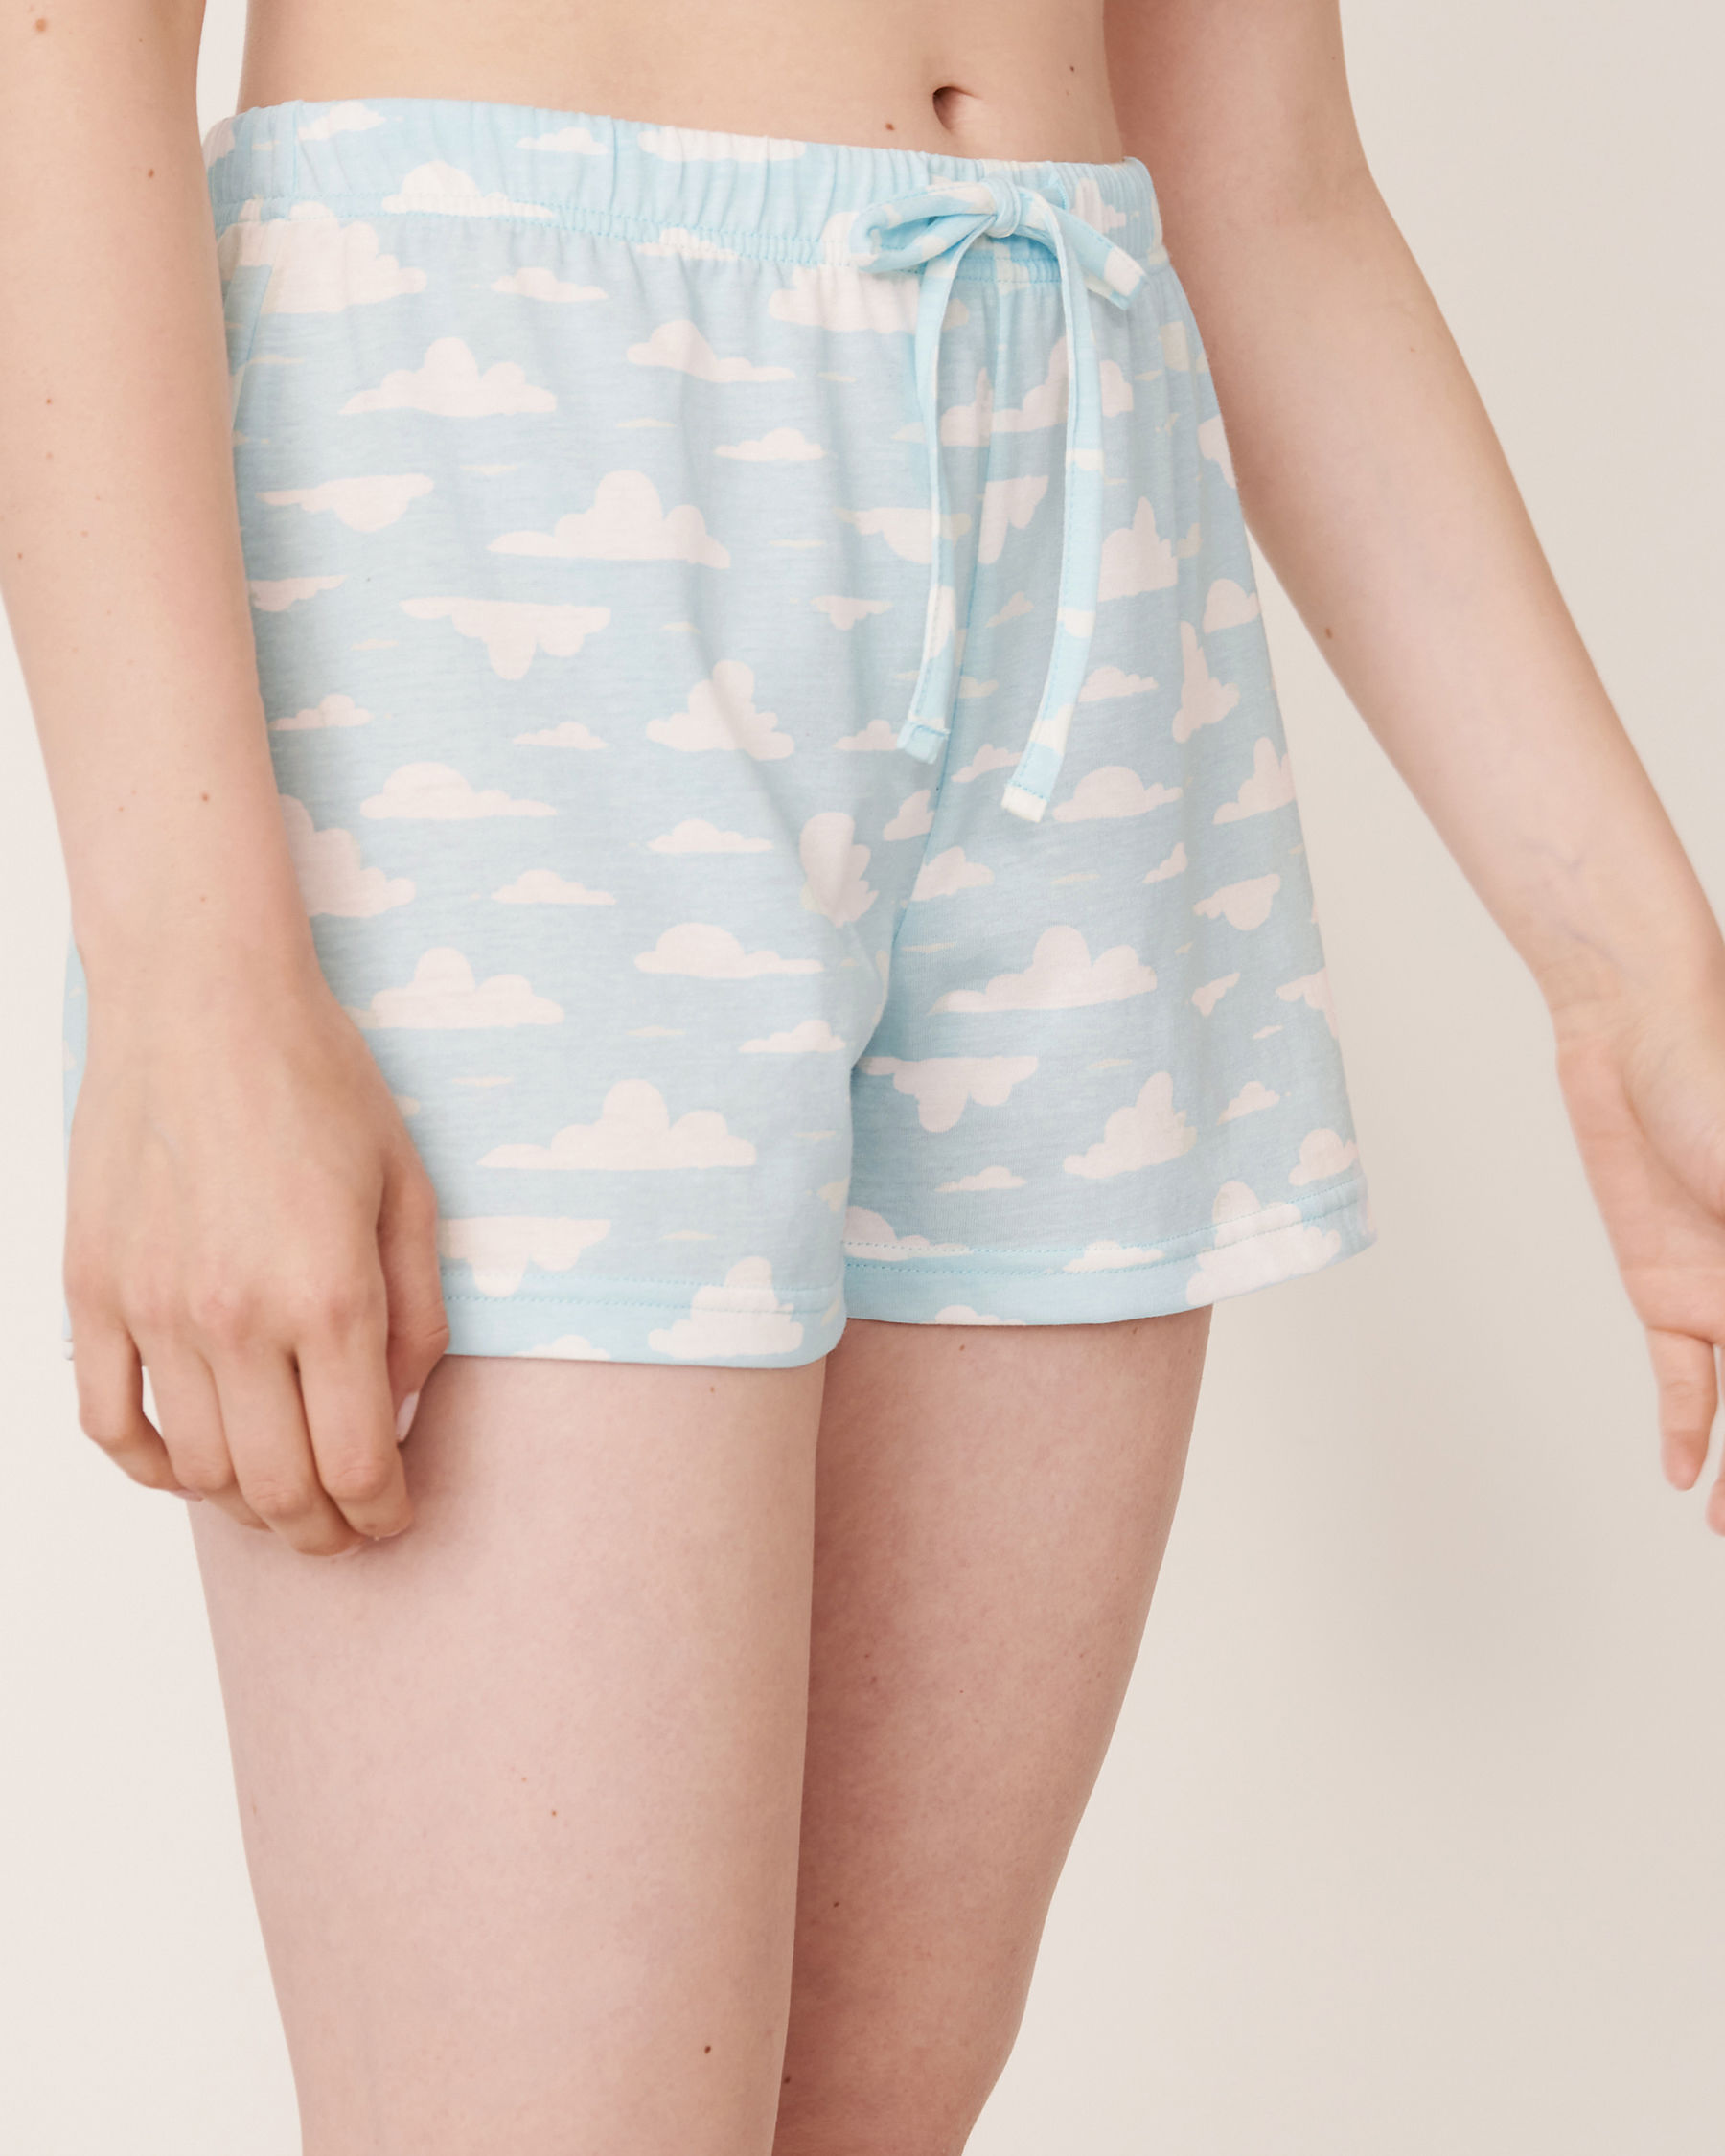 LA VIE EN ROSE Pyjama Short Clouds 40200158 - View1